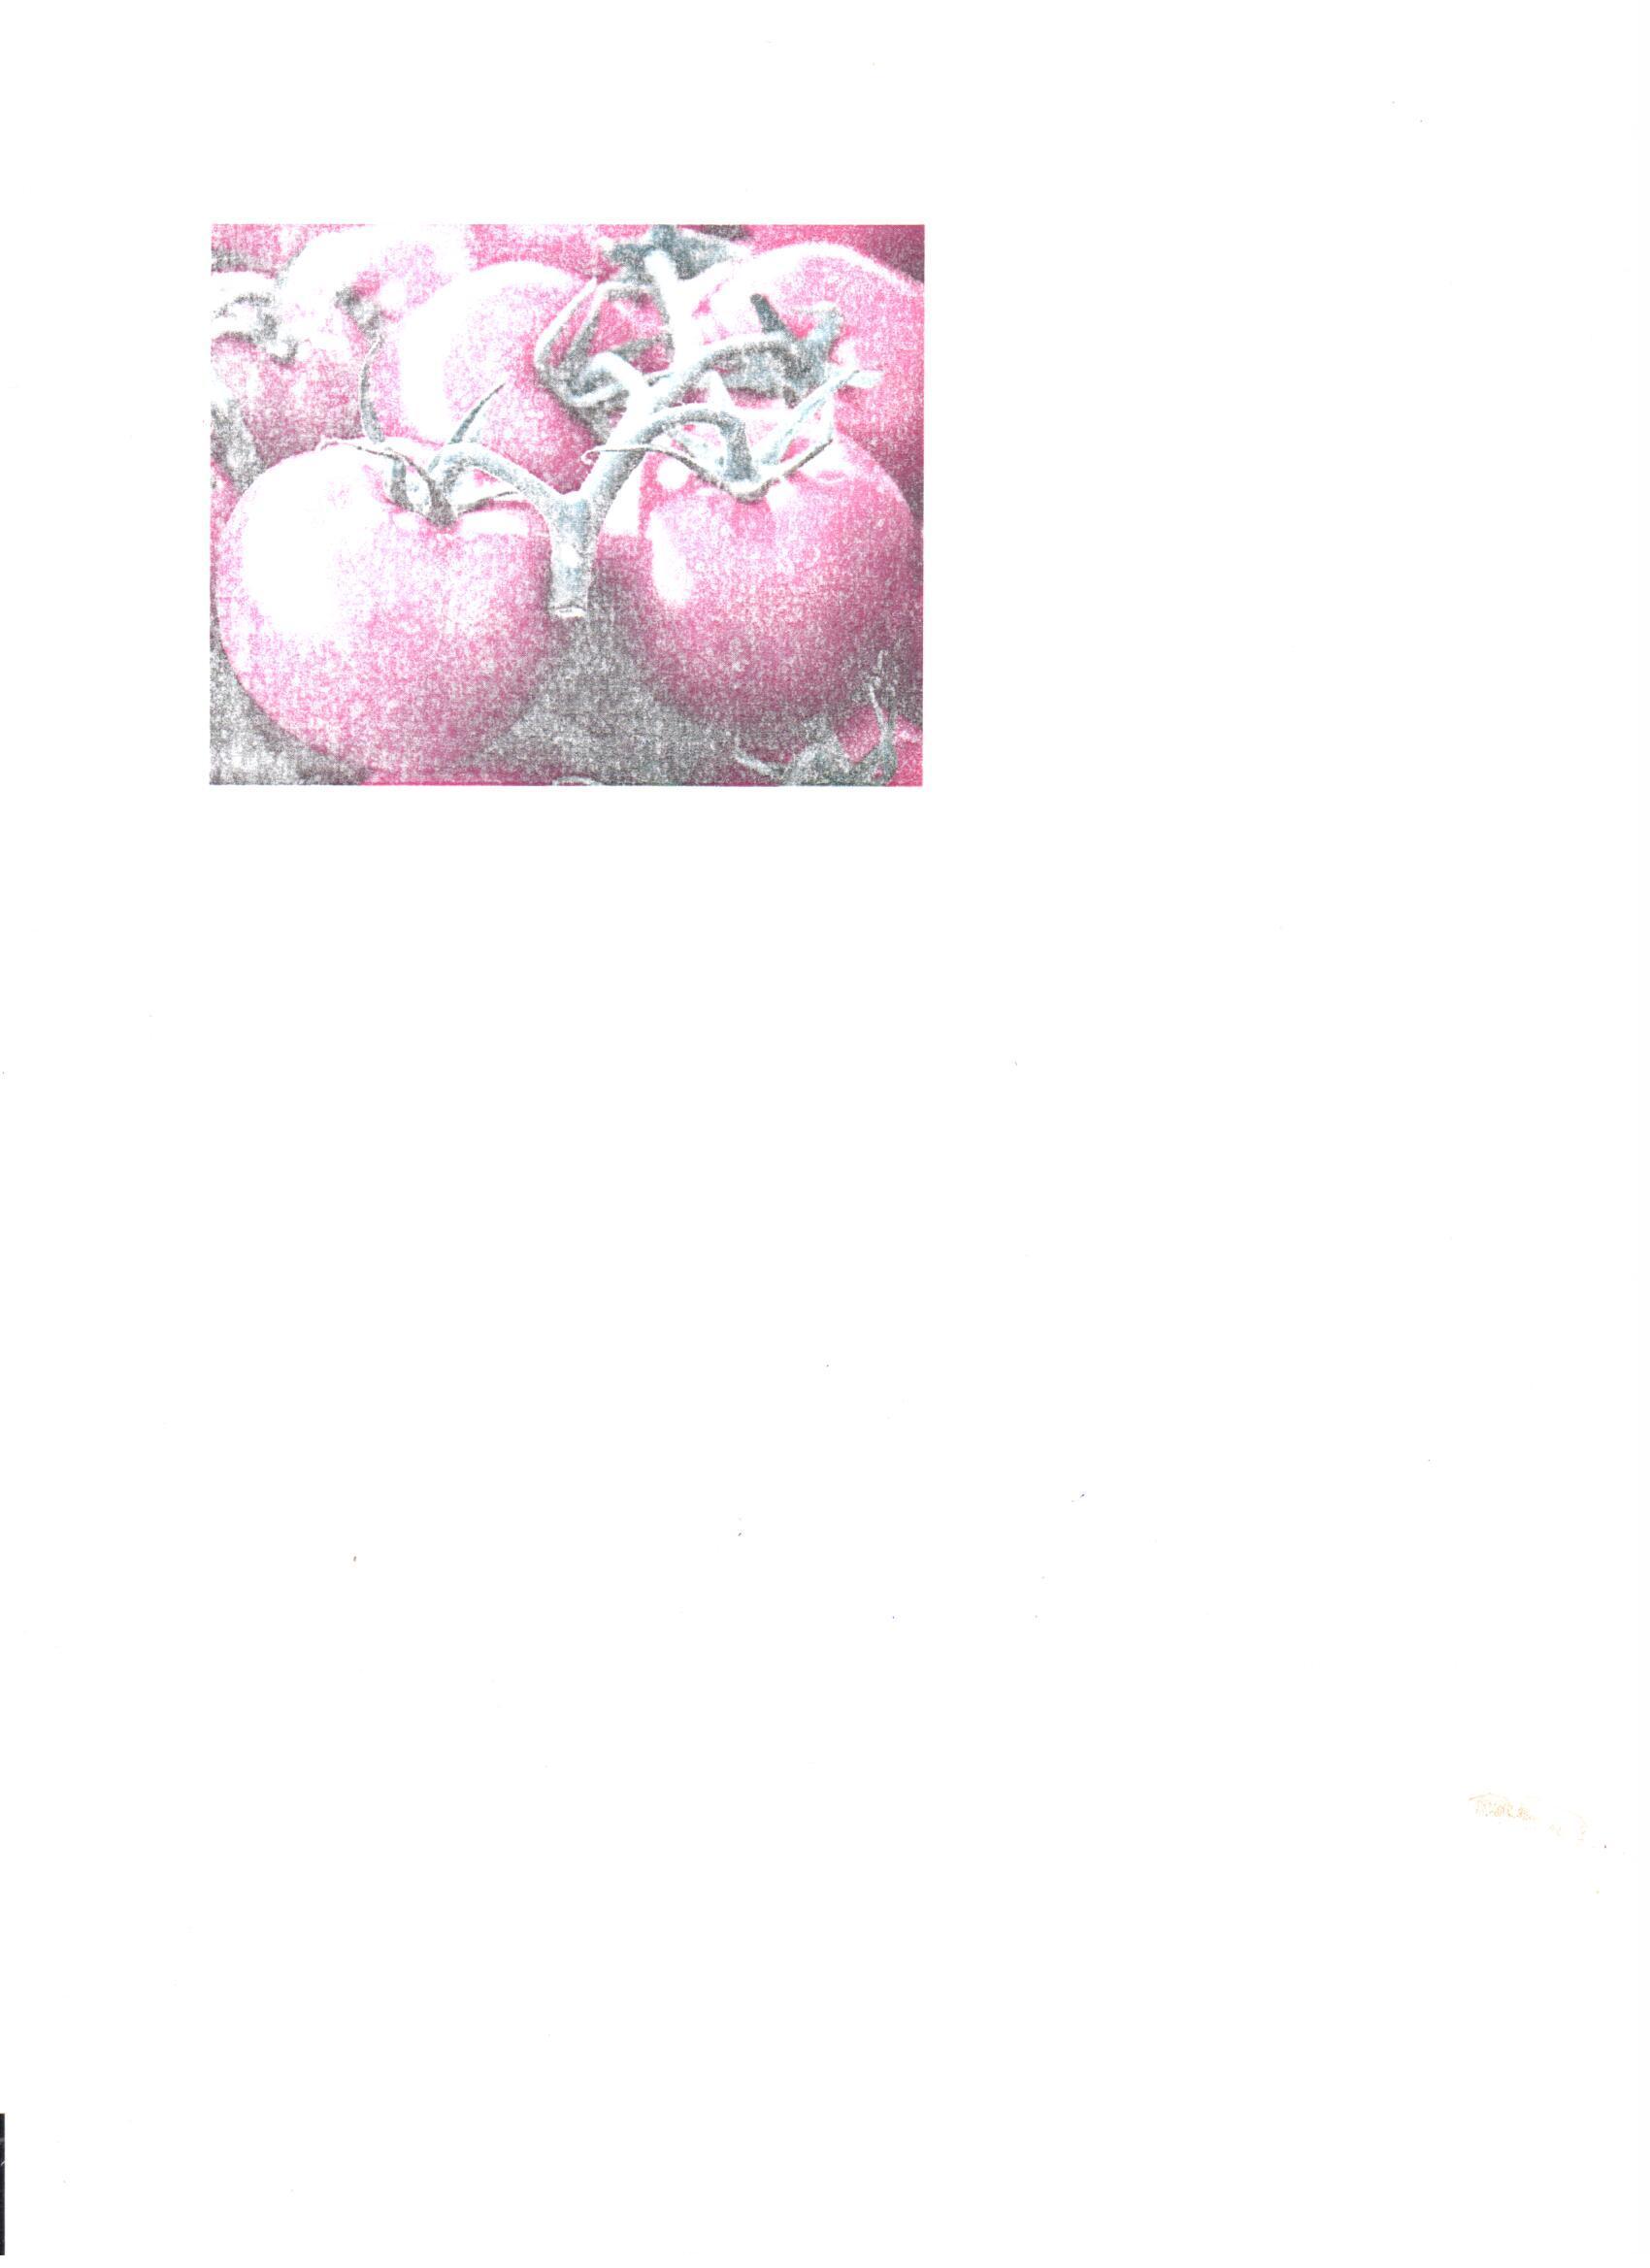 tomato-eba627c31923bfa327b8b4d366bf2c876fe1d6b0-s6-c30.jpg